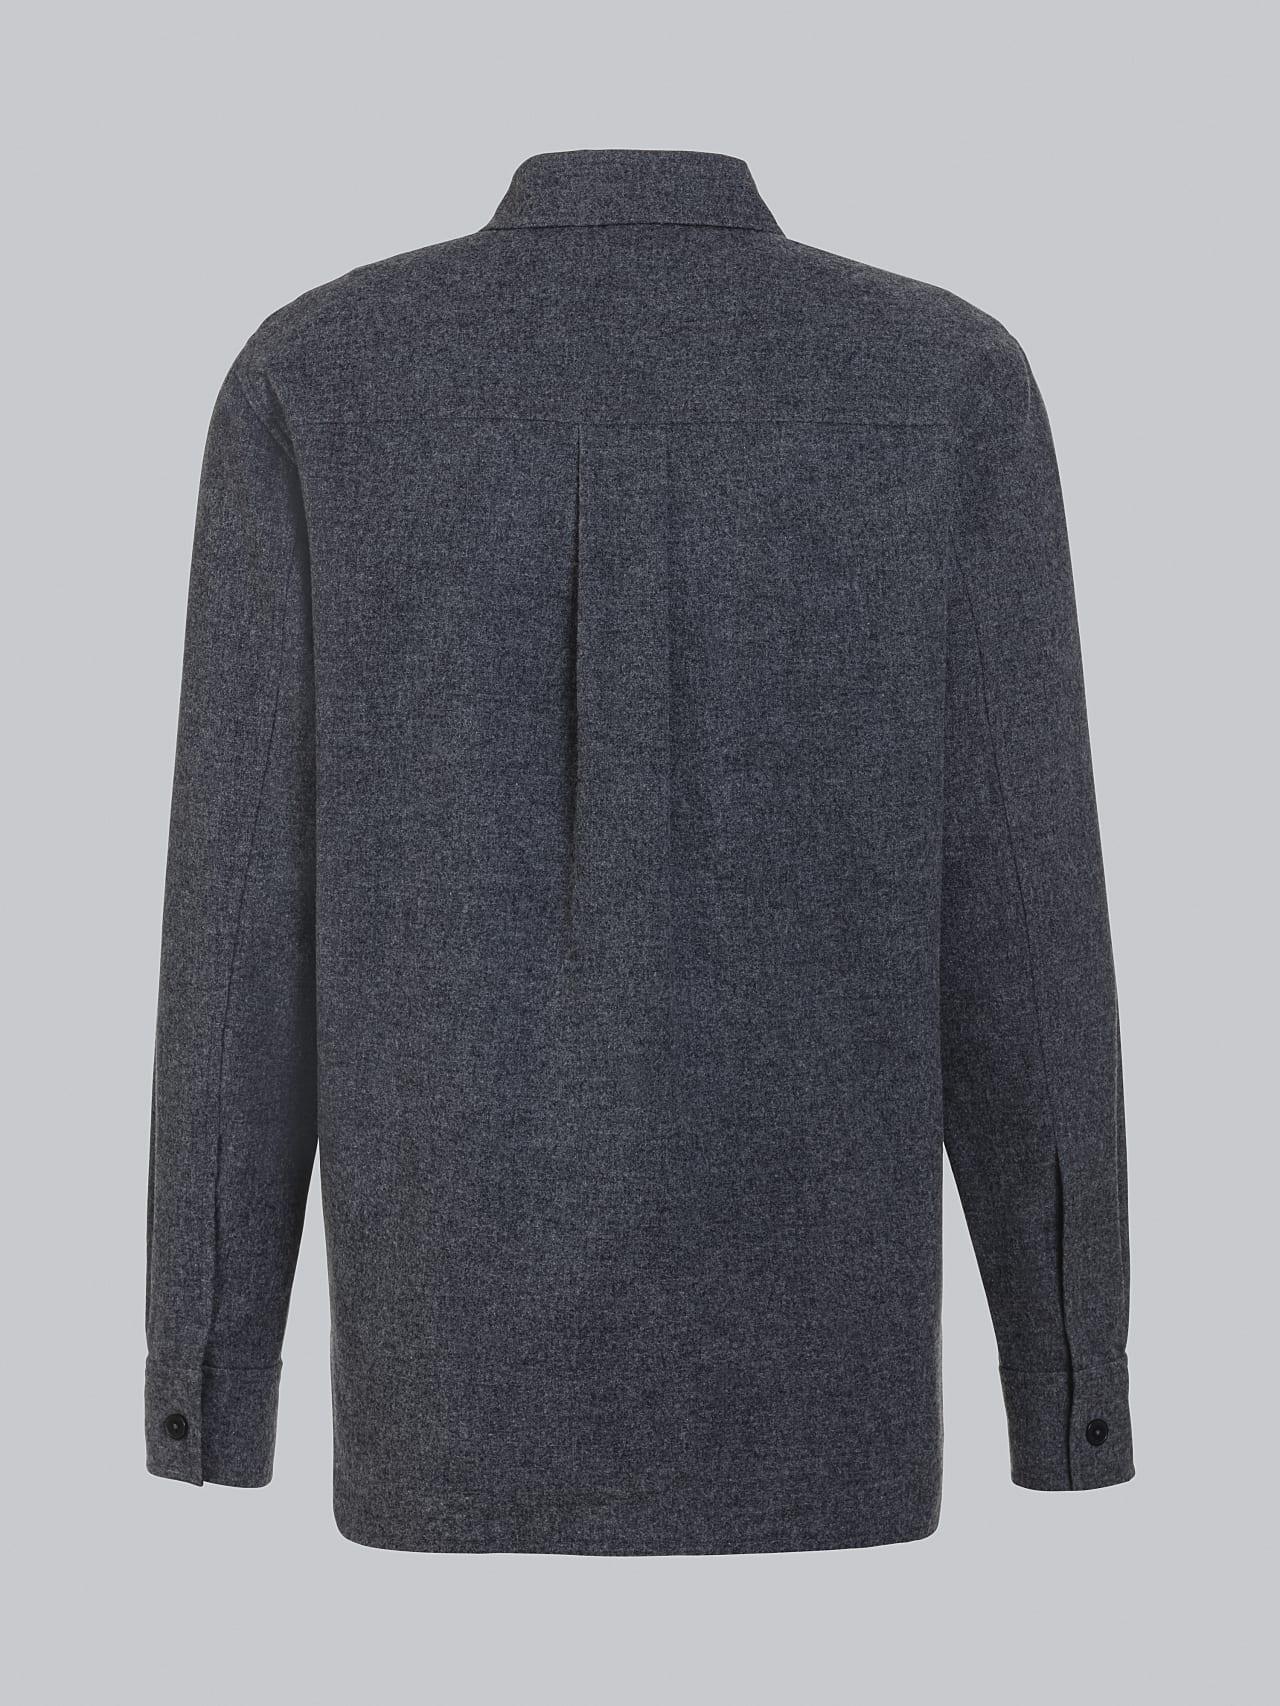 WOVER V1.Y5.02 Wool Over-Shirt navy Left Alpha Tauri